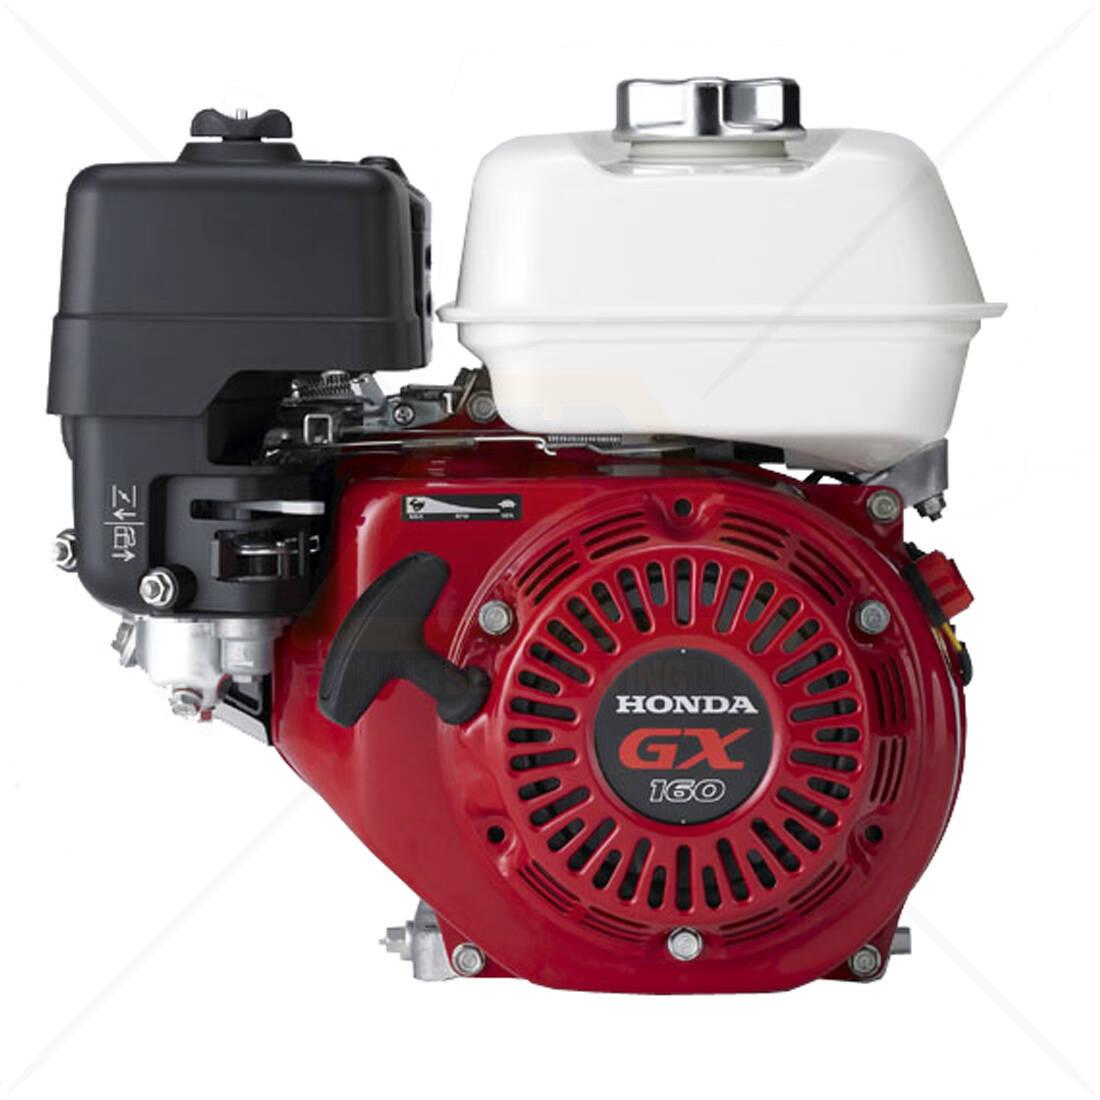 honda 160 gx manual free user guide u2022 rh globalexpresspackers co service manual for honda gx160 Honda GX120 Parts Diagram